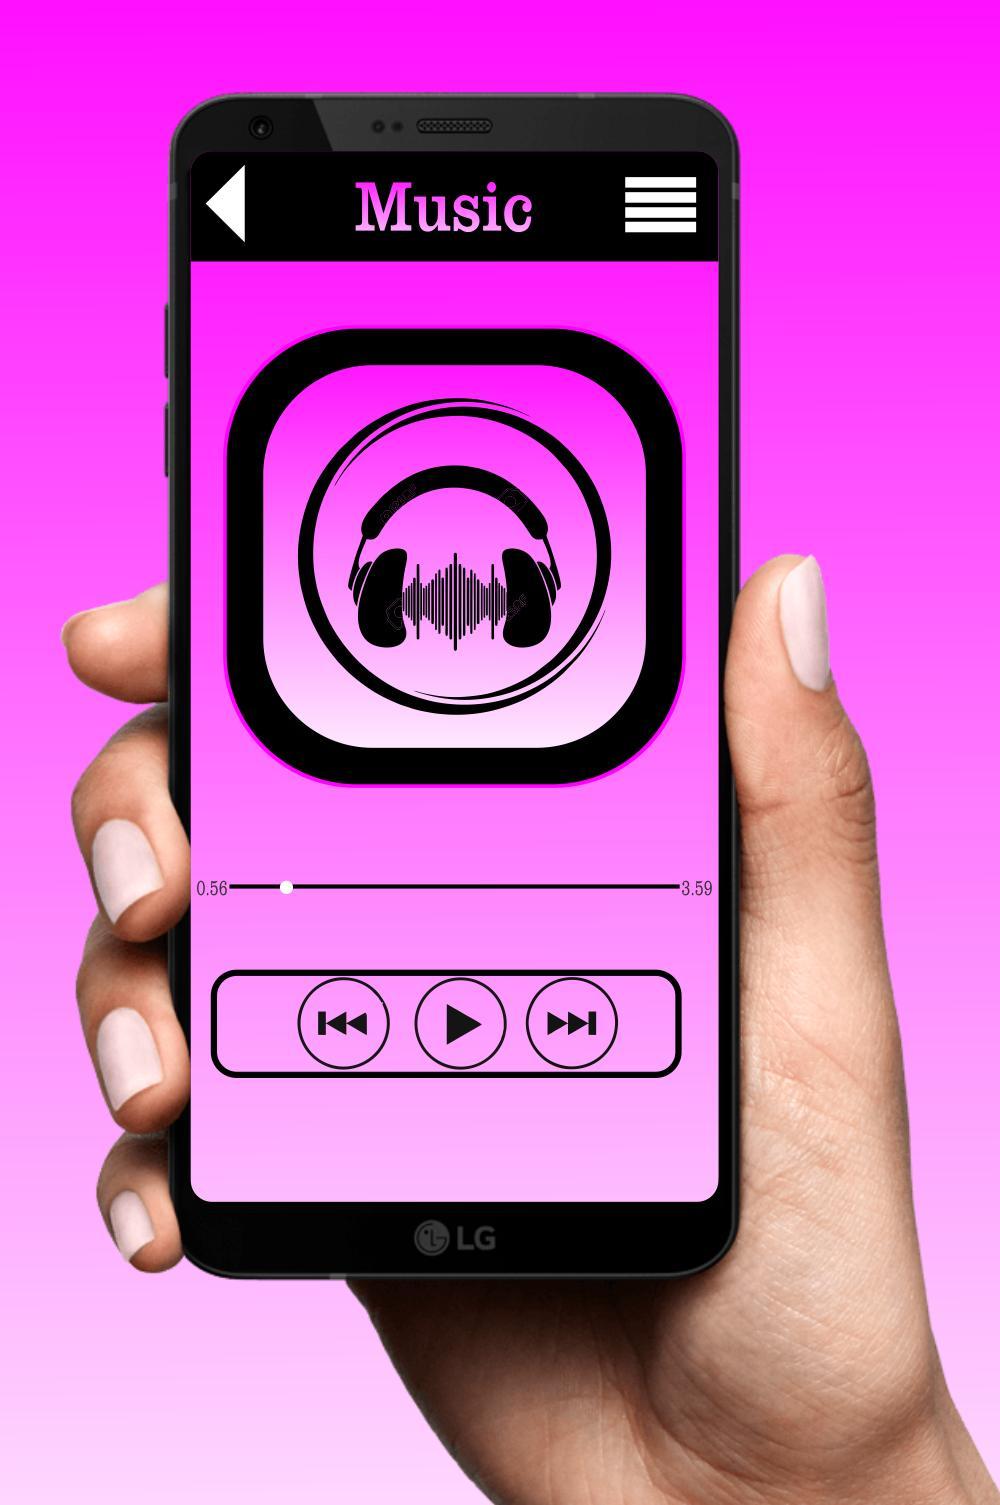 Musica Paula Fernandes Beijo Bom For Android Apk Download